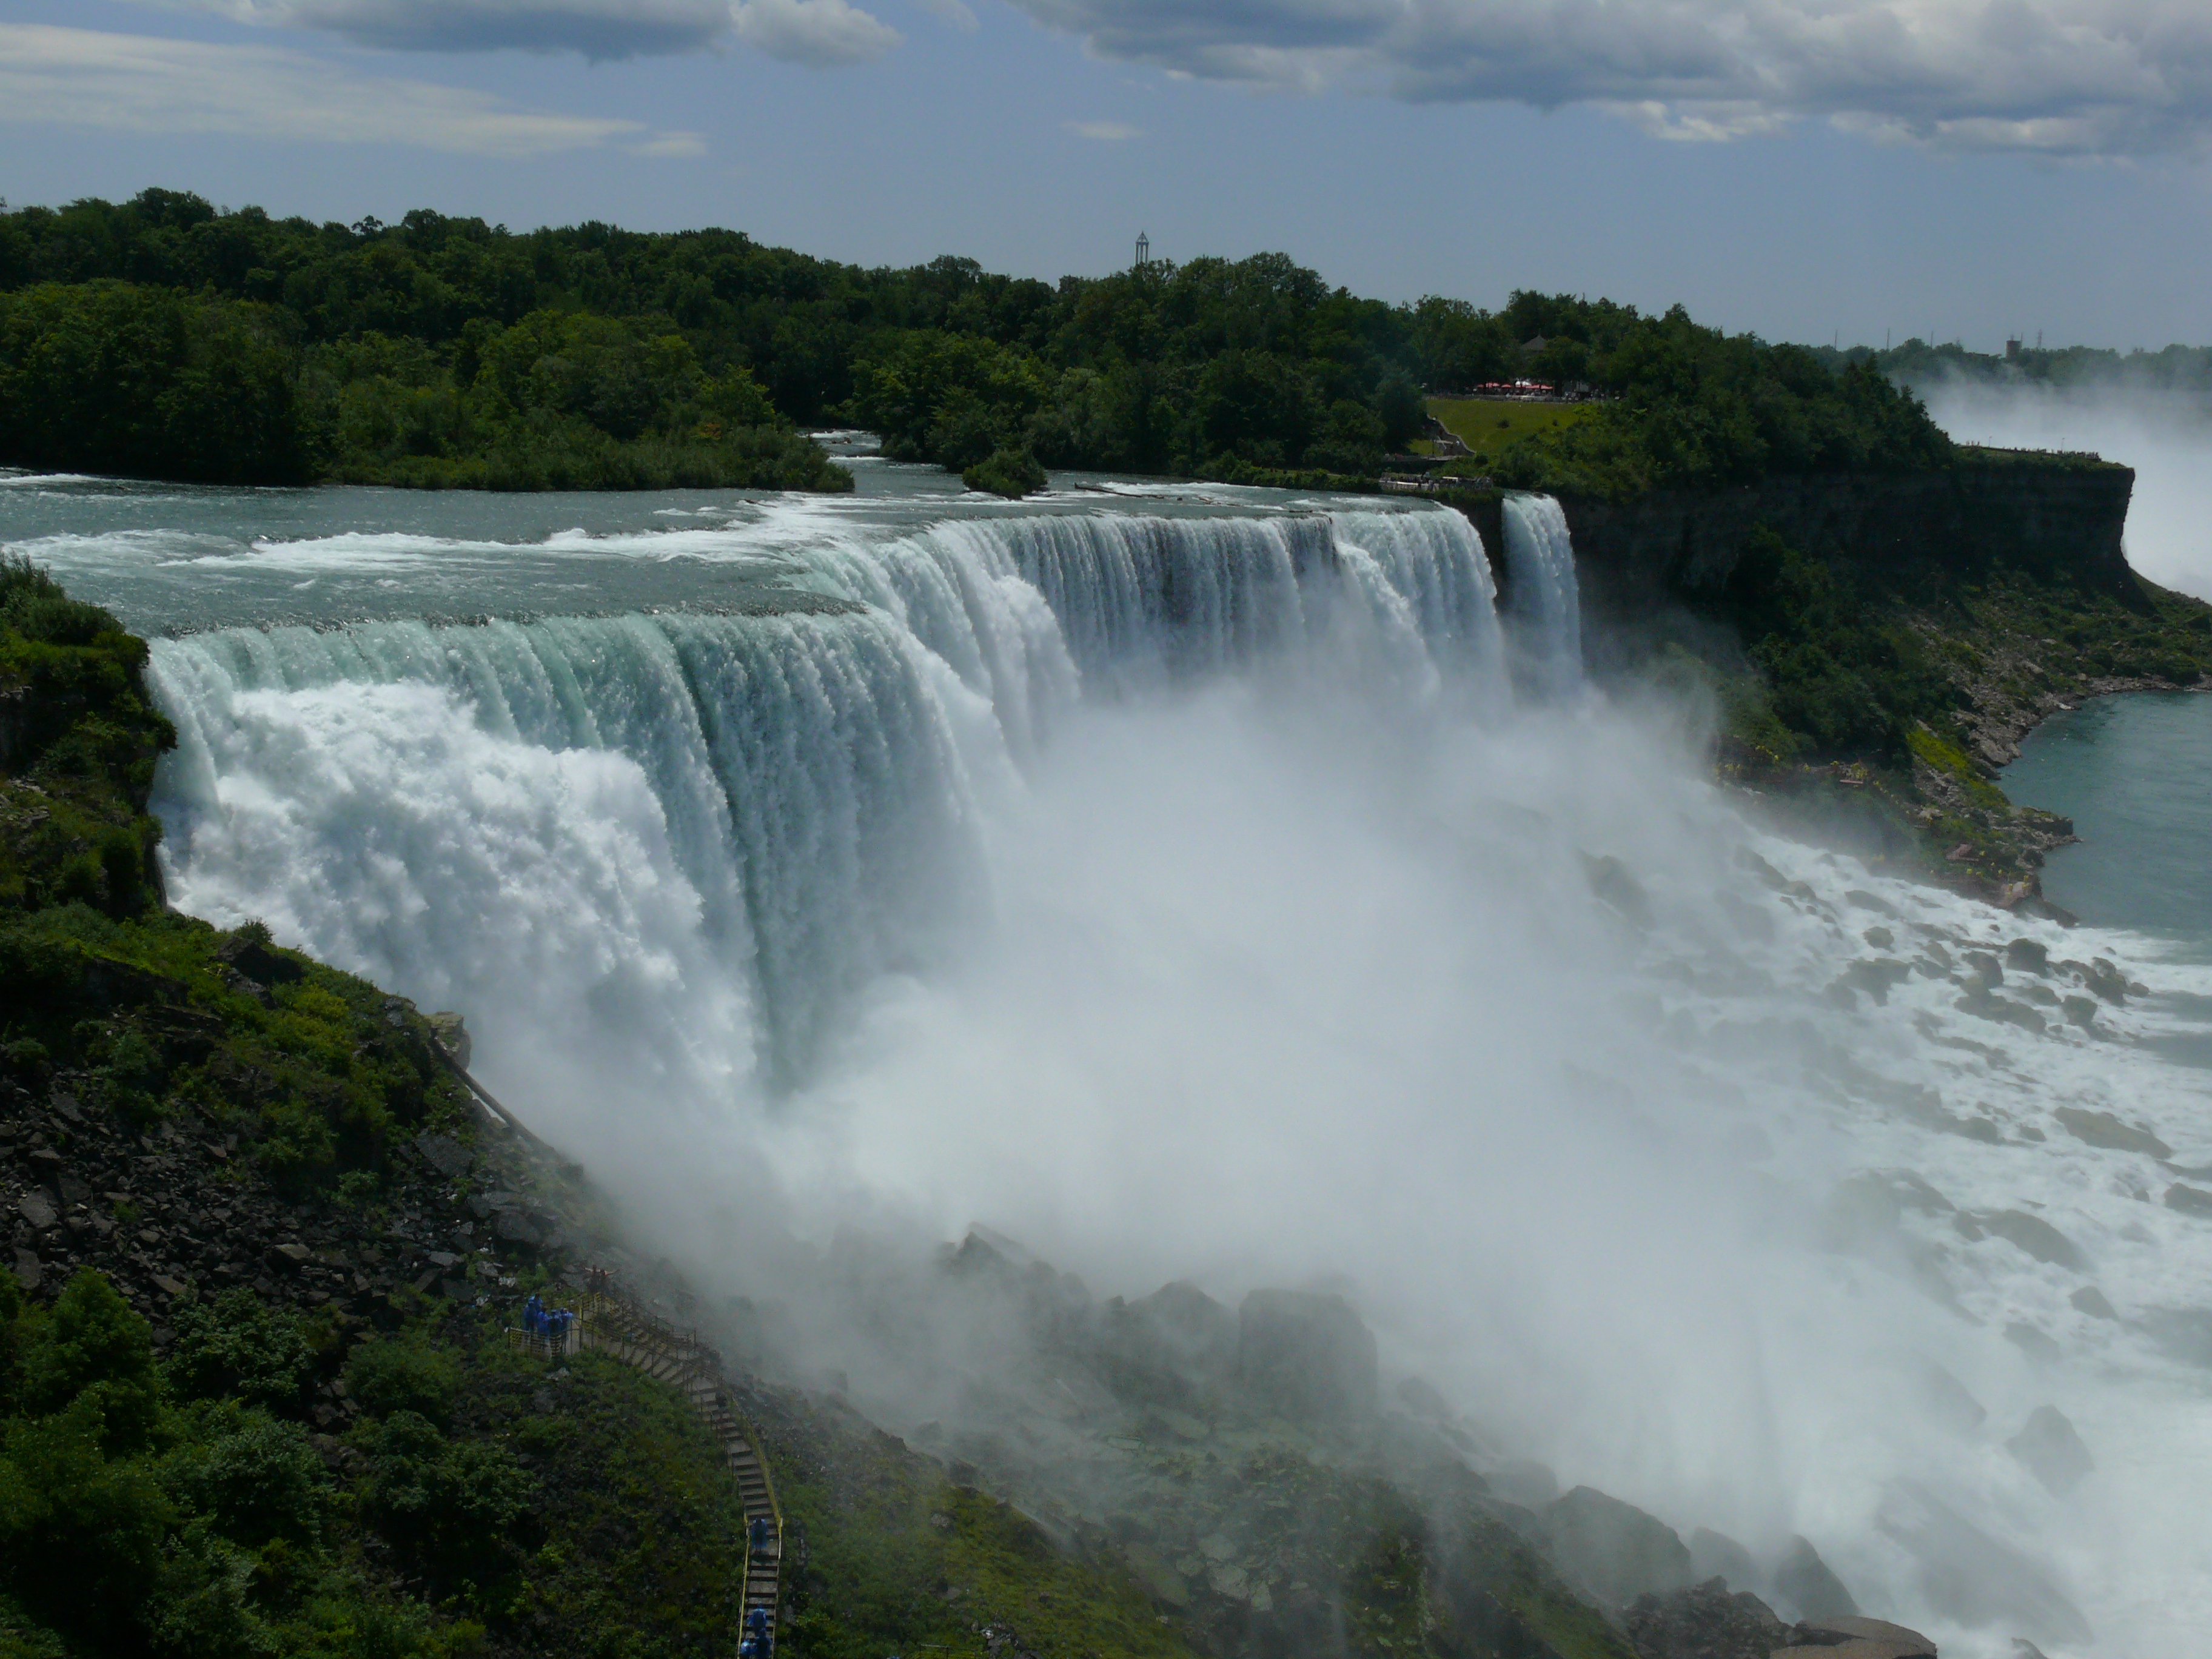 File:American falls 7.JPG - Wikimedia Commons